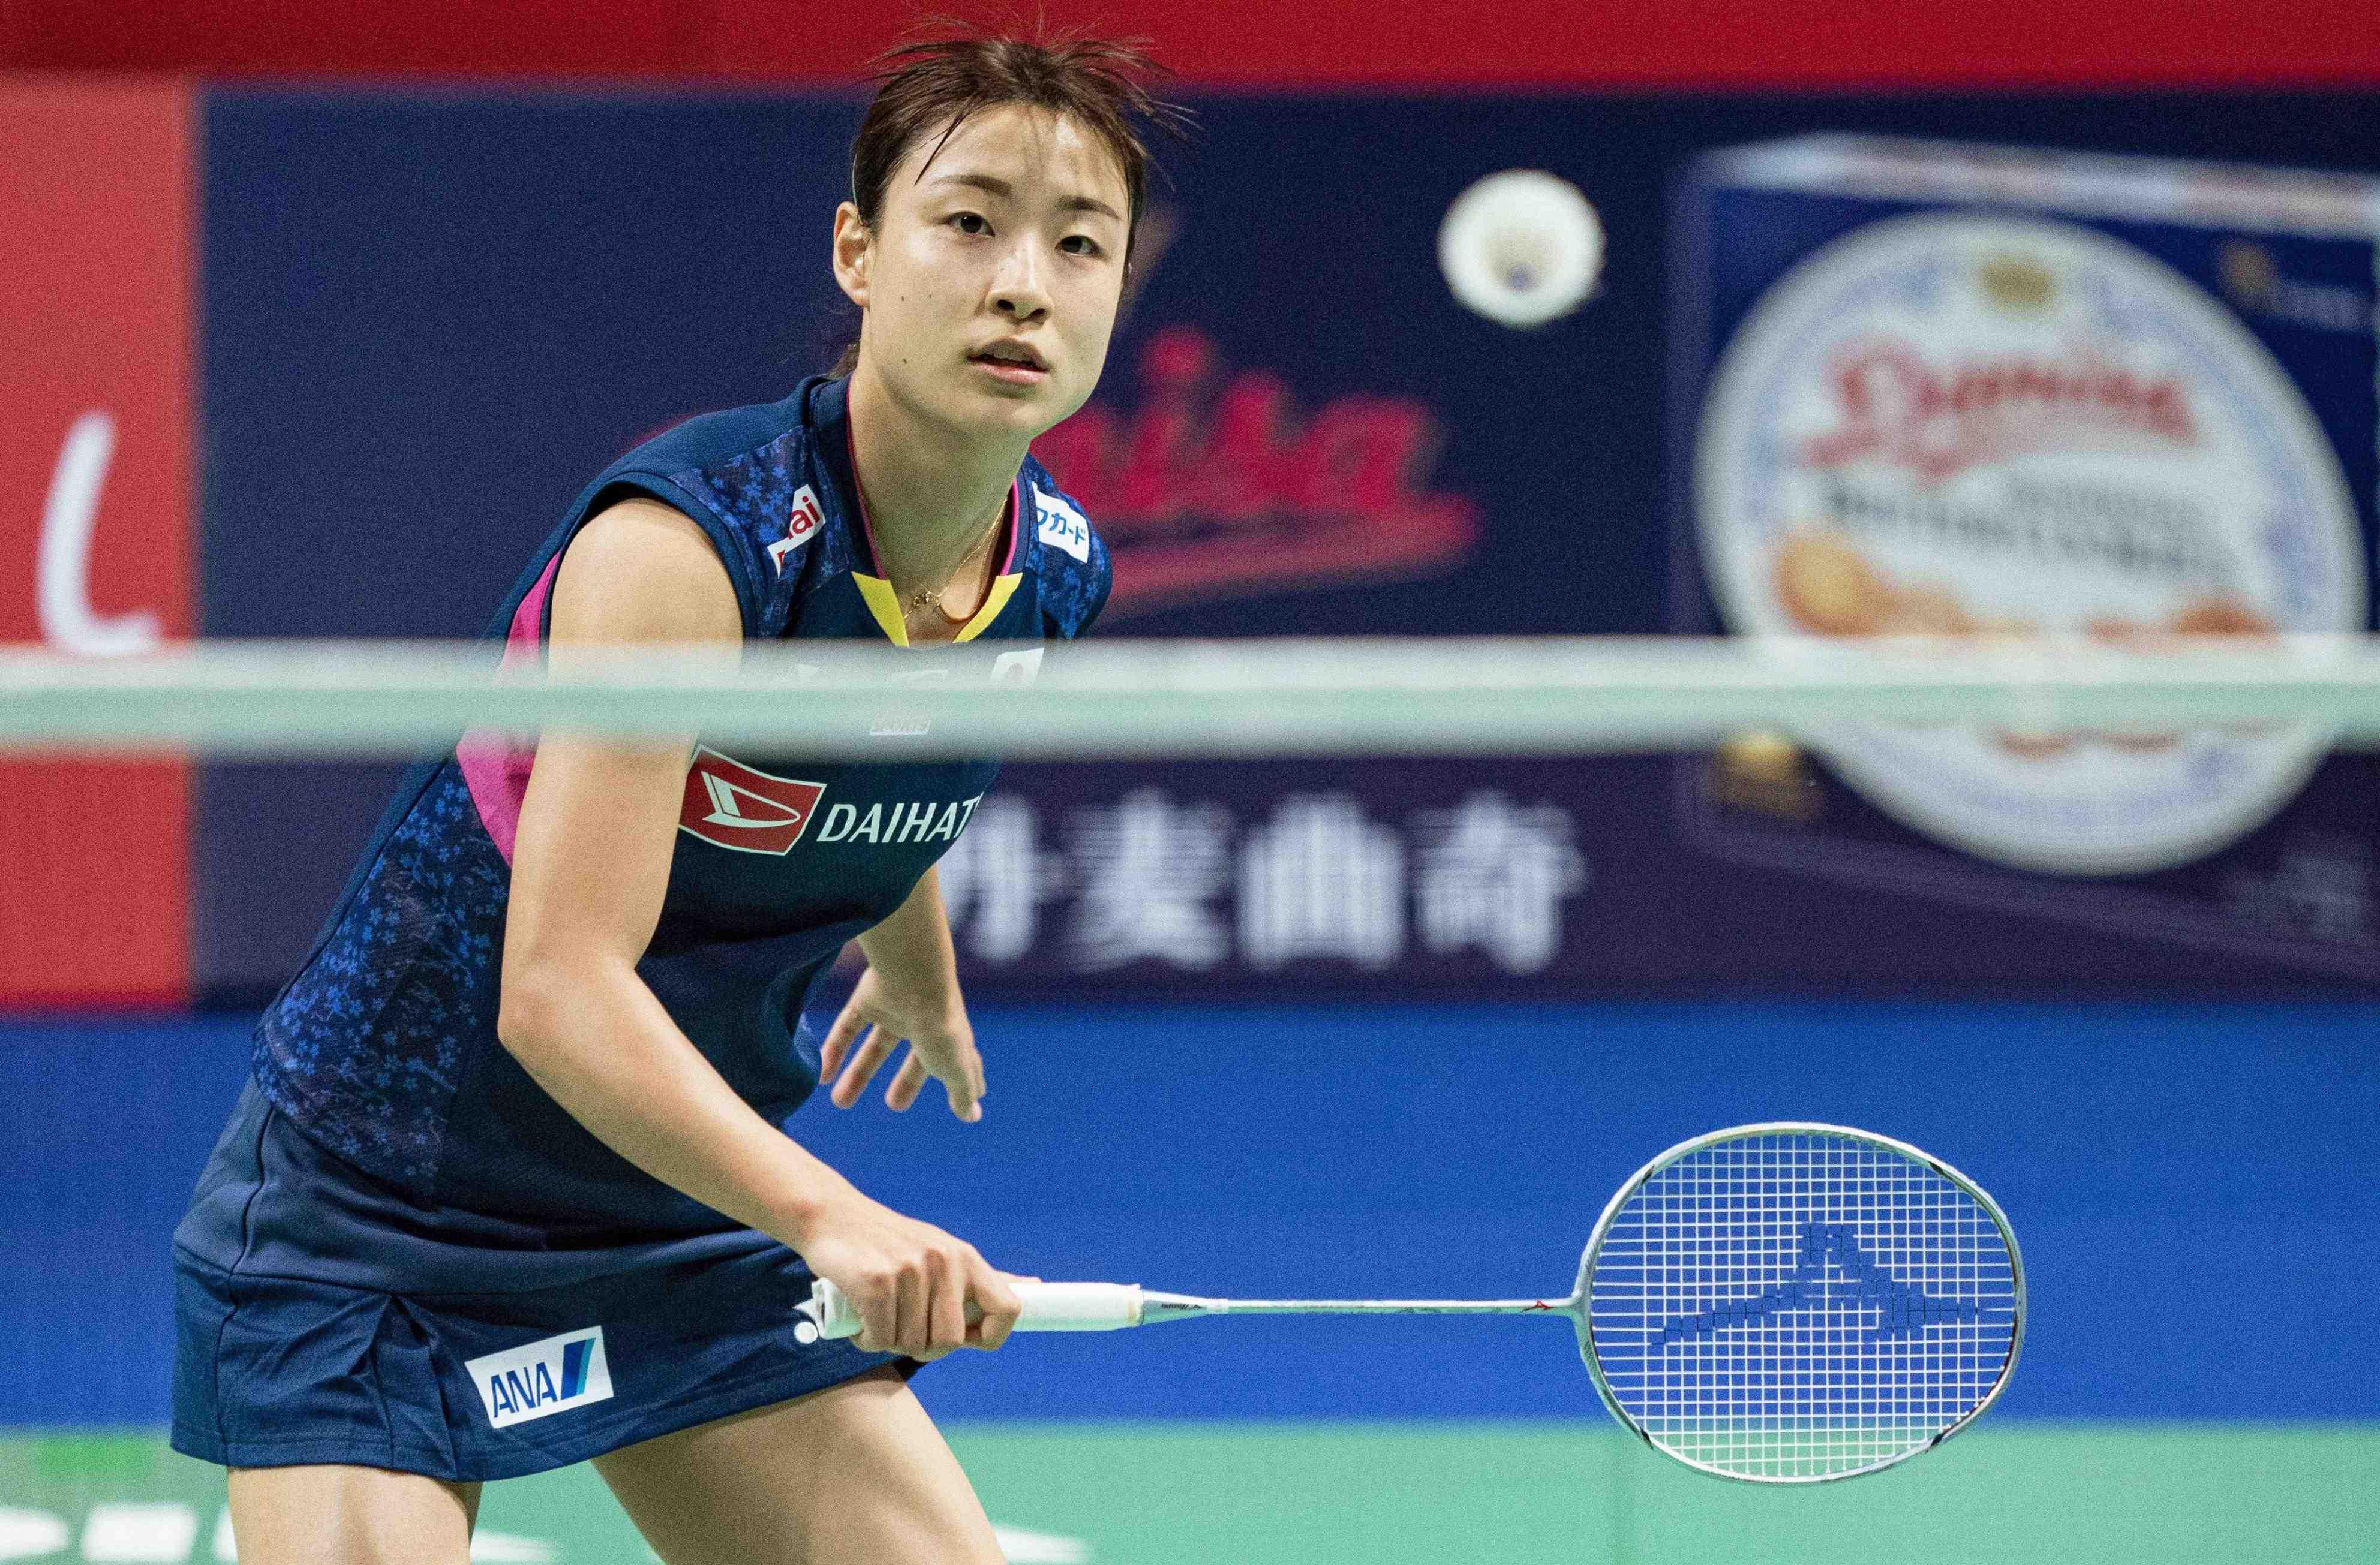 Badminton Nozomi Okuhara was the winner of the Denmark Open 004